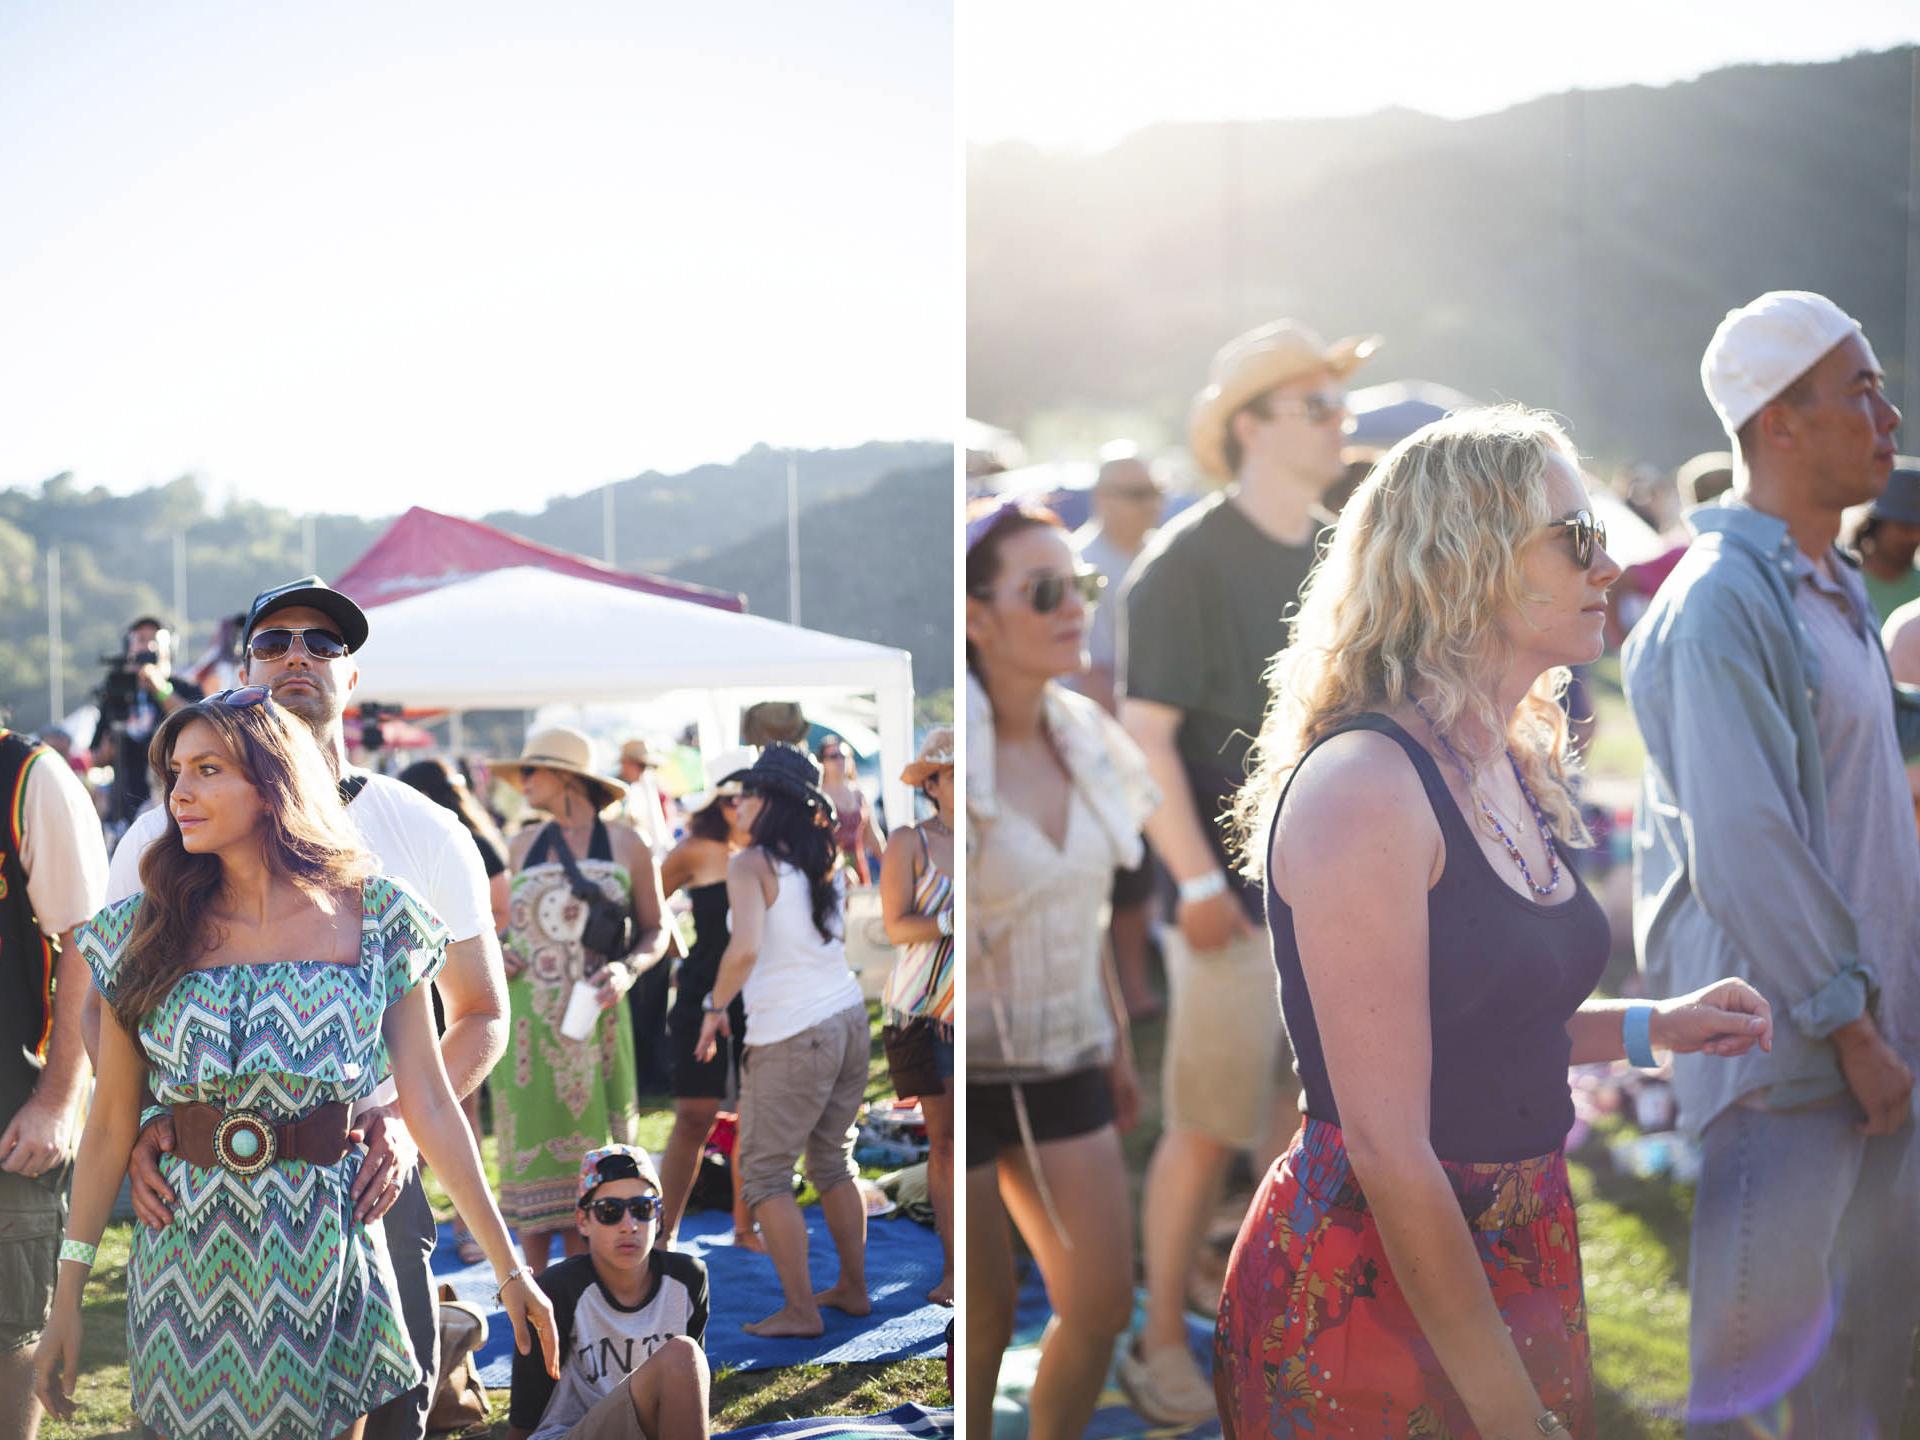 reggae+pon+the+mountain+2013+1.jpg